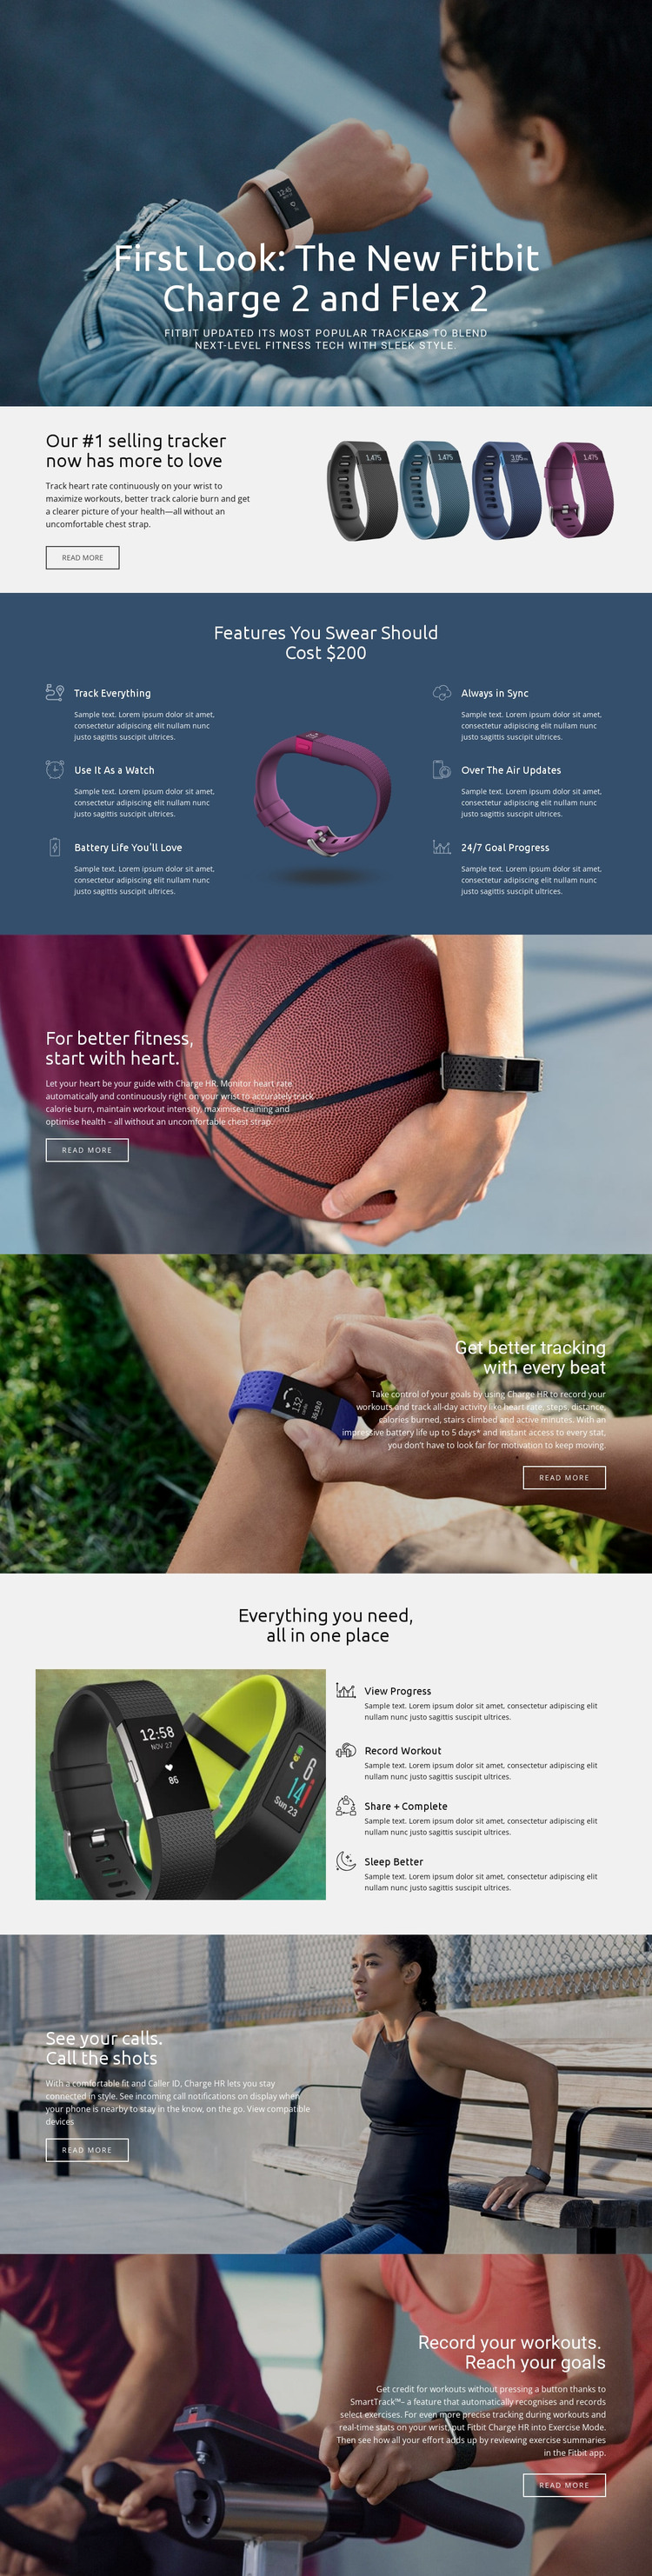 Flex 2 Web Design